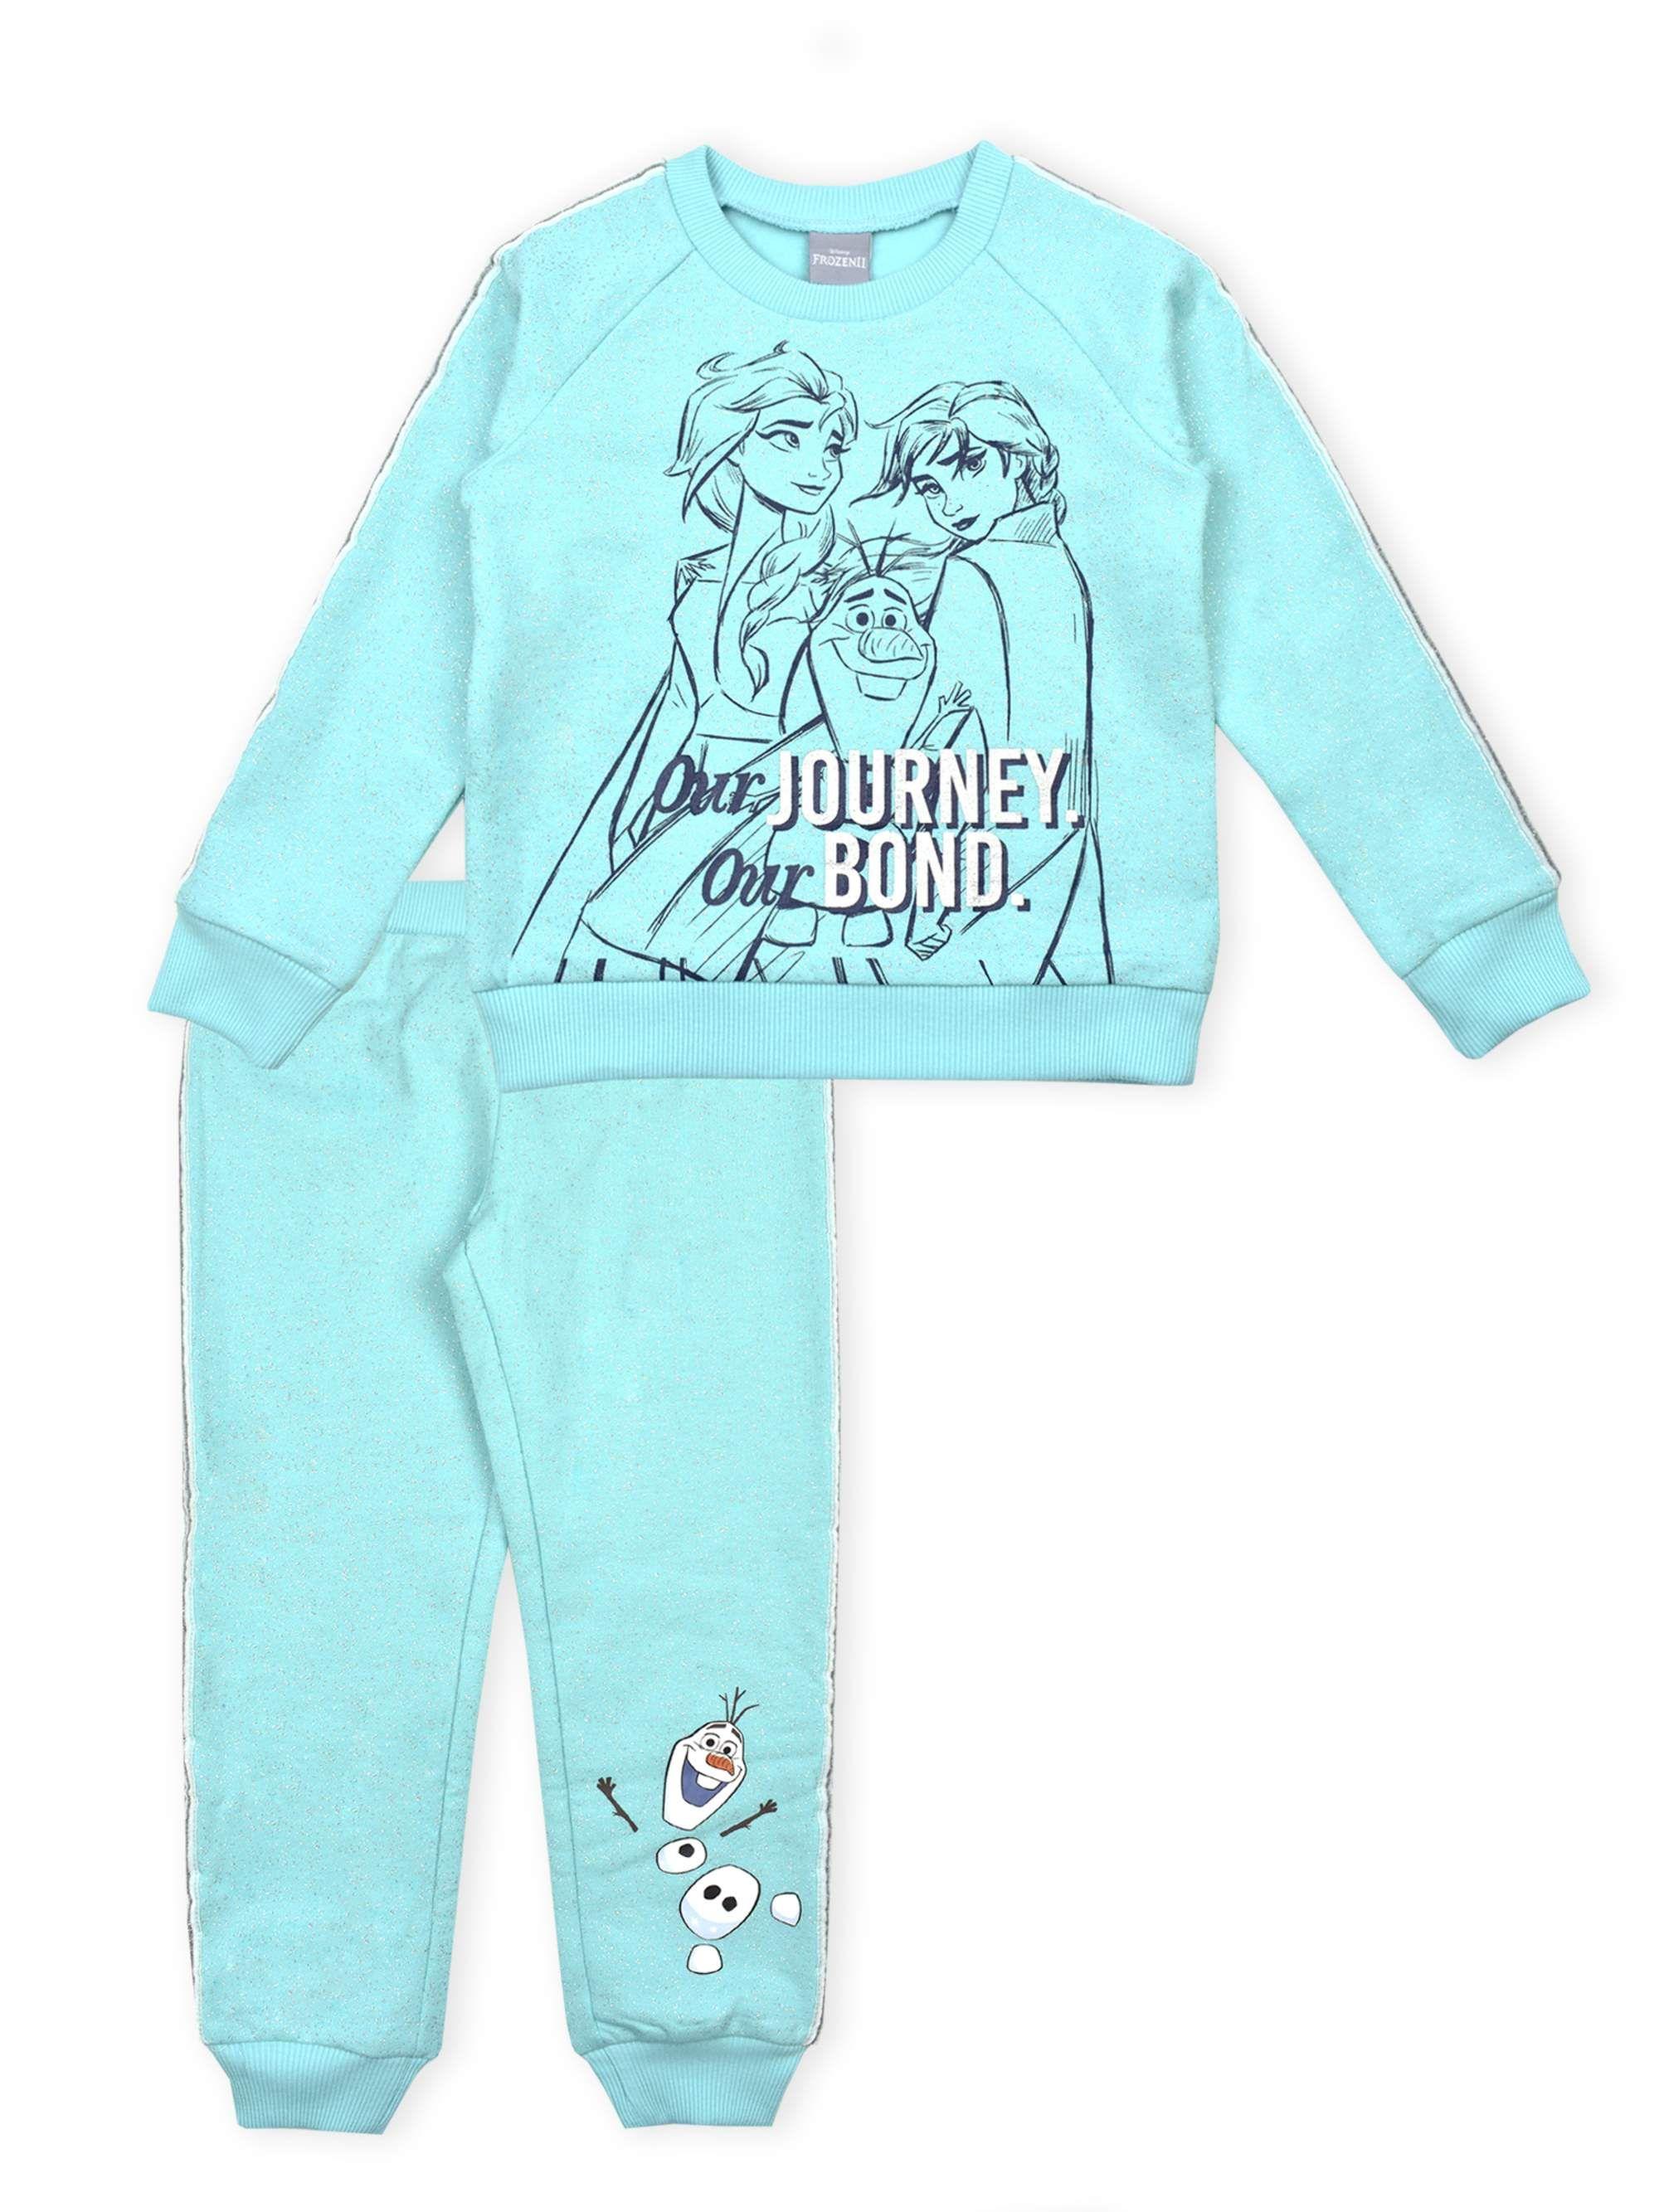 Frozen 2 Disney Frozen 2 Anna Elsa Toddler Girl Glitter Racer Stripe Sweatshirt Jogger Pants 2pc Outfit Set Walmart Com Striped Sweatshirts Big Girl Clothes Kids Fashion Inspiration [ 2667 x 2000 Pixel ]